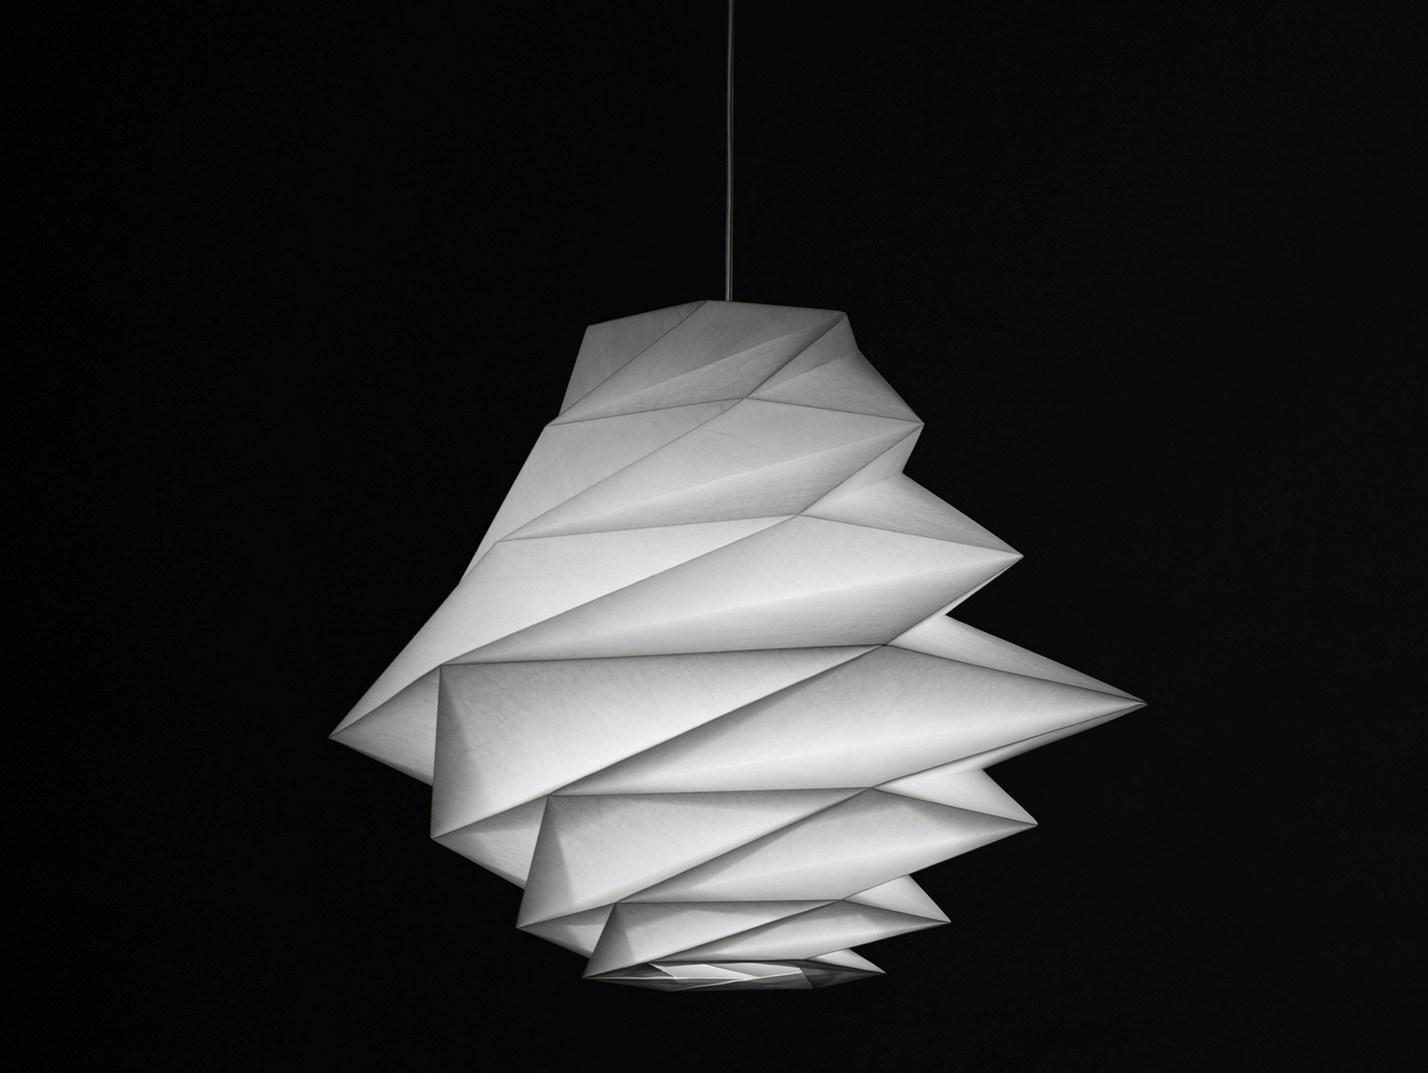 In ei issey miyake la collezione di lampade firmata artemide - Outlet artemide ...